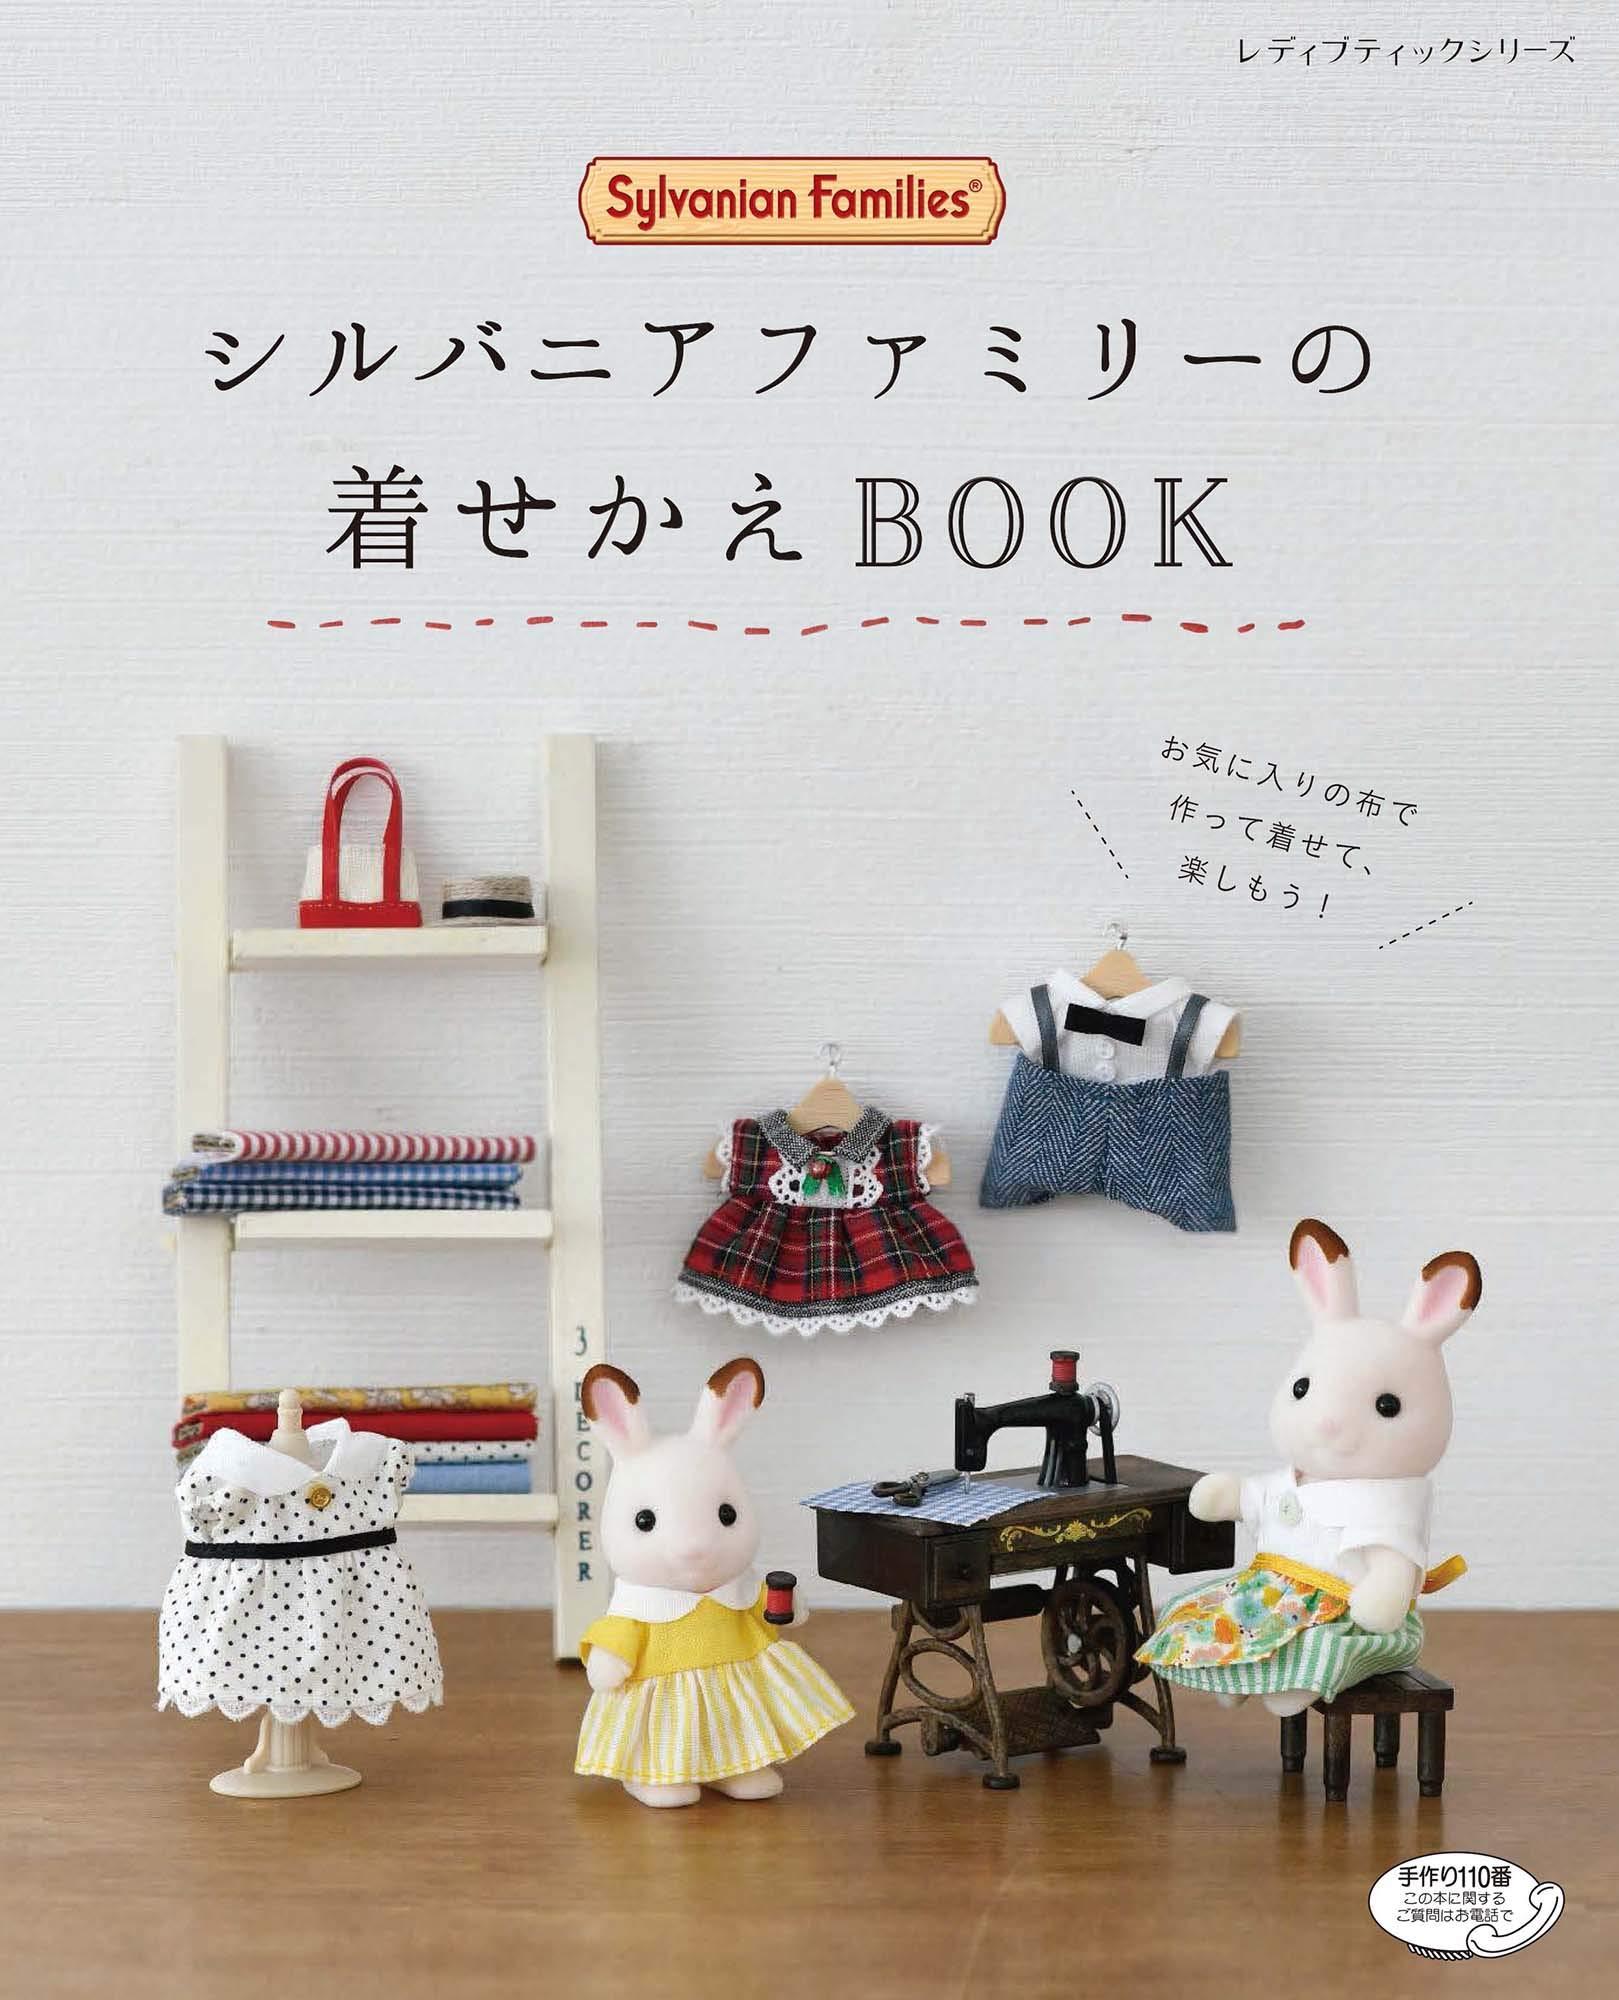 Dressing BOOK of Sylvanian Families